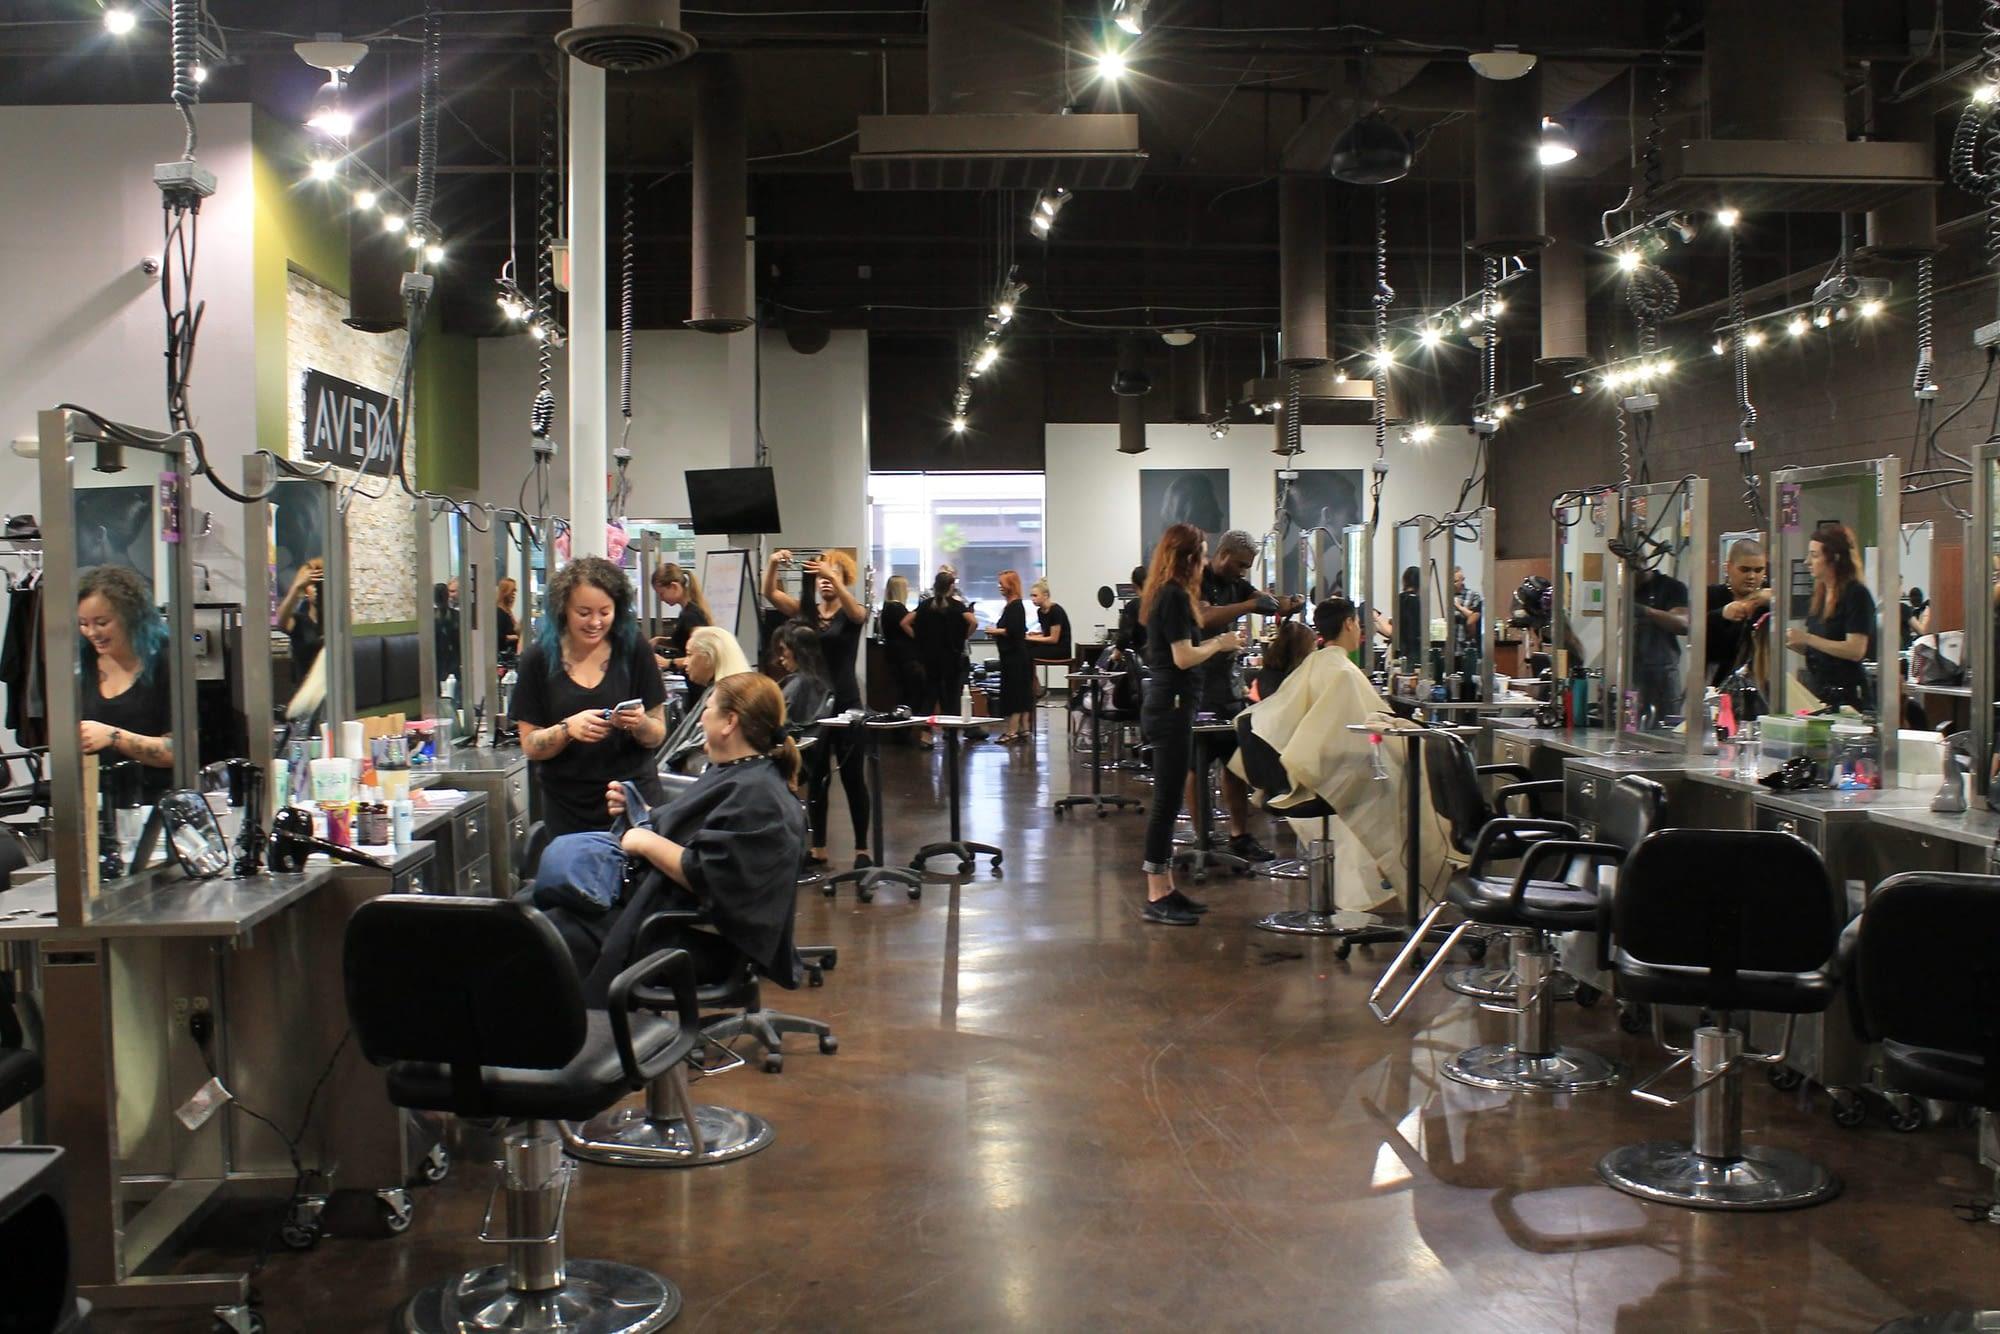 Student salon at Aveda Las Vegas